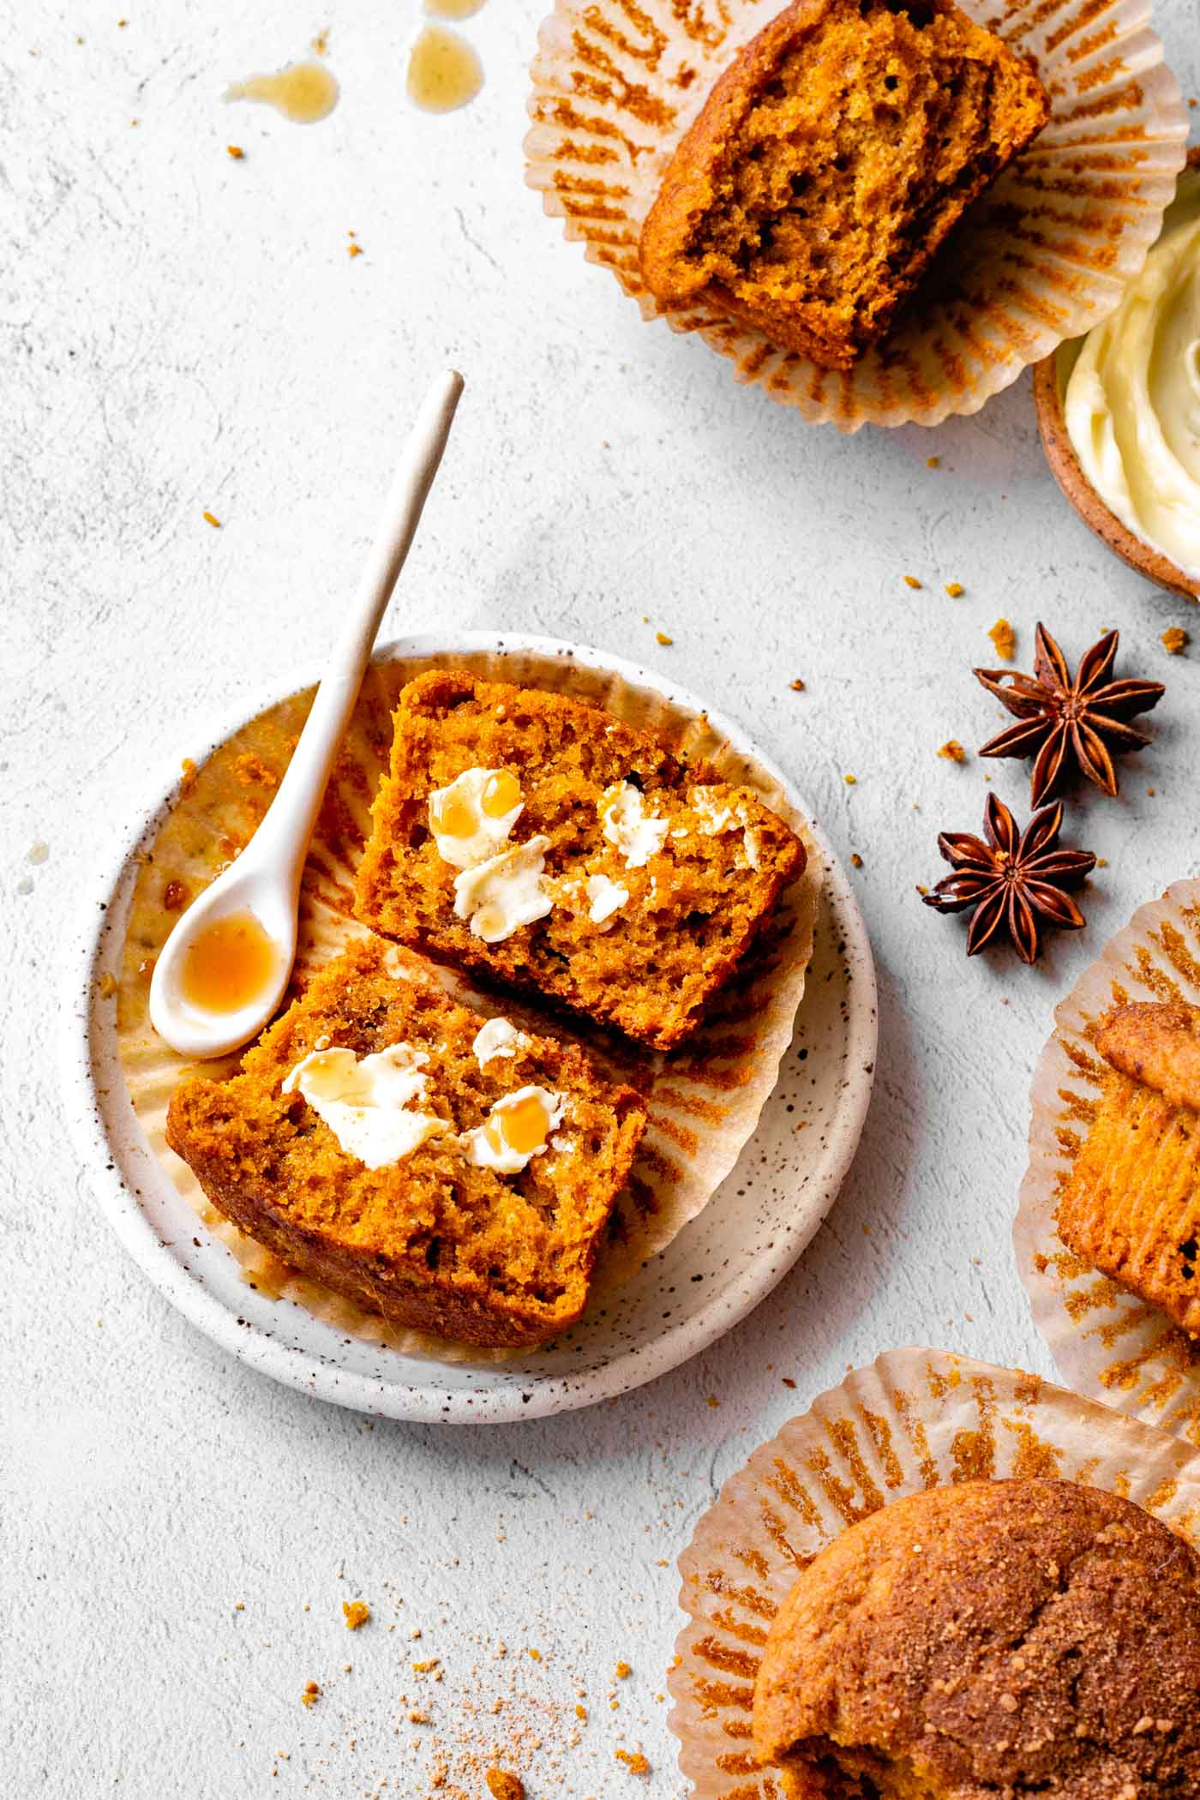 gluten-free pumpkin muffins on a rustic light gray surface looking tempting